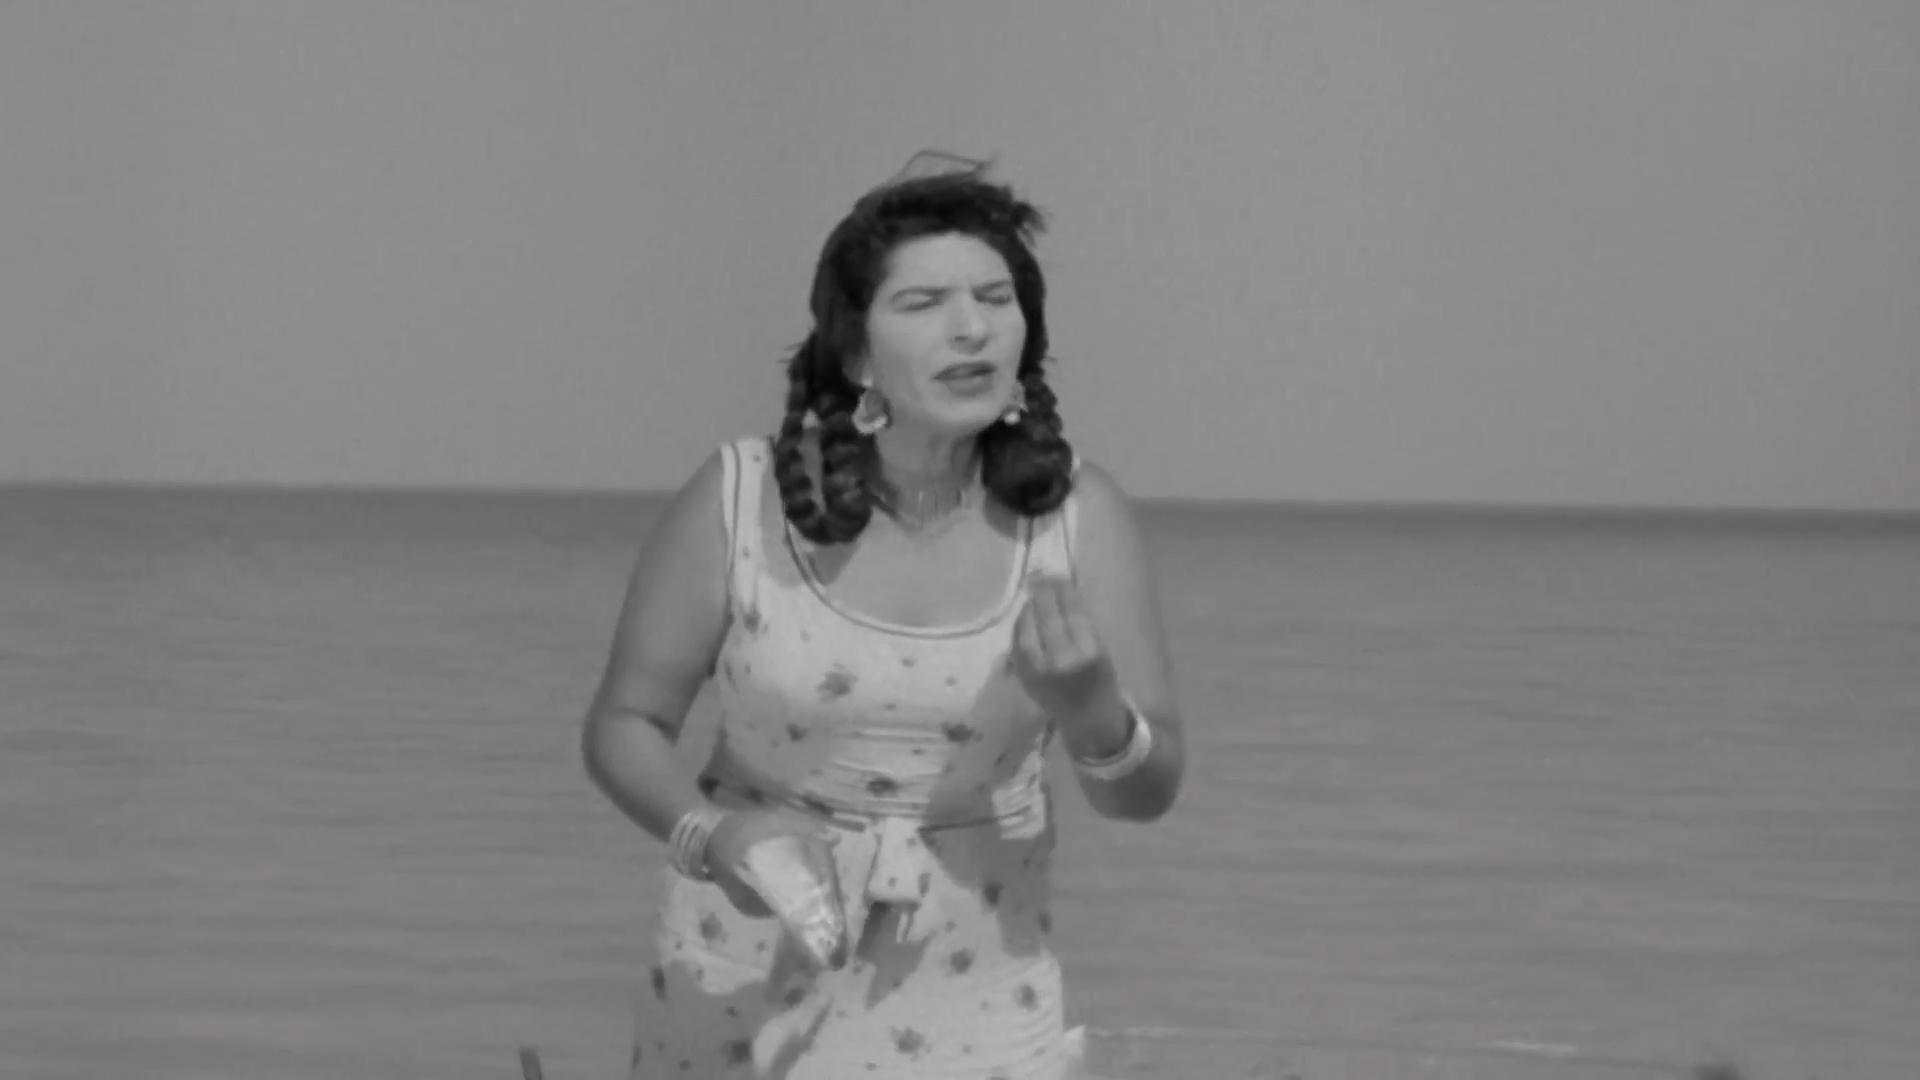 [فيلم][تورنت][تحميل][ابن حميدو][1957][1080p][Web-DL] 7 arabp2p.com